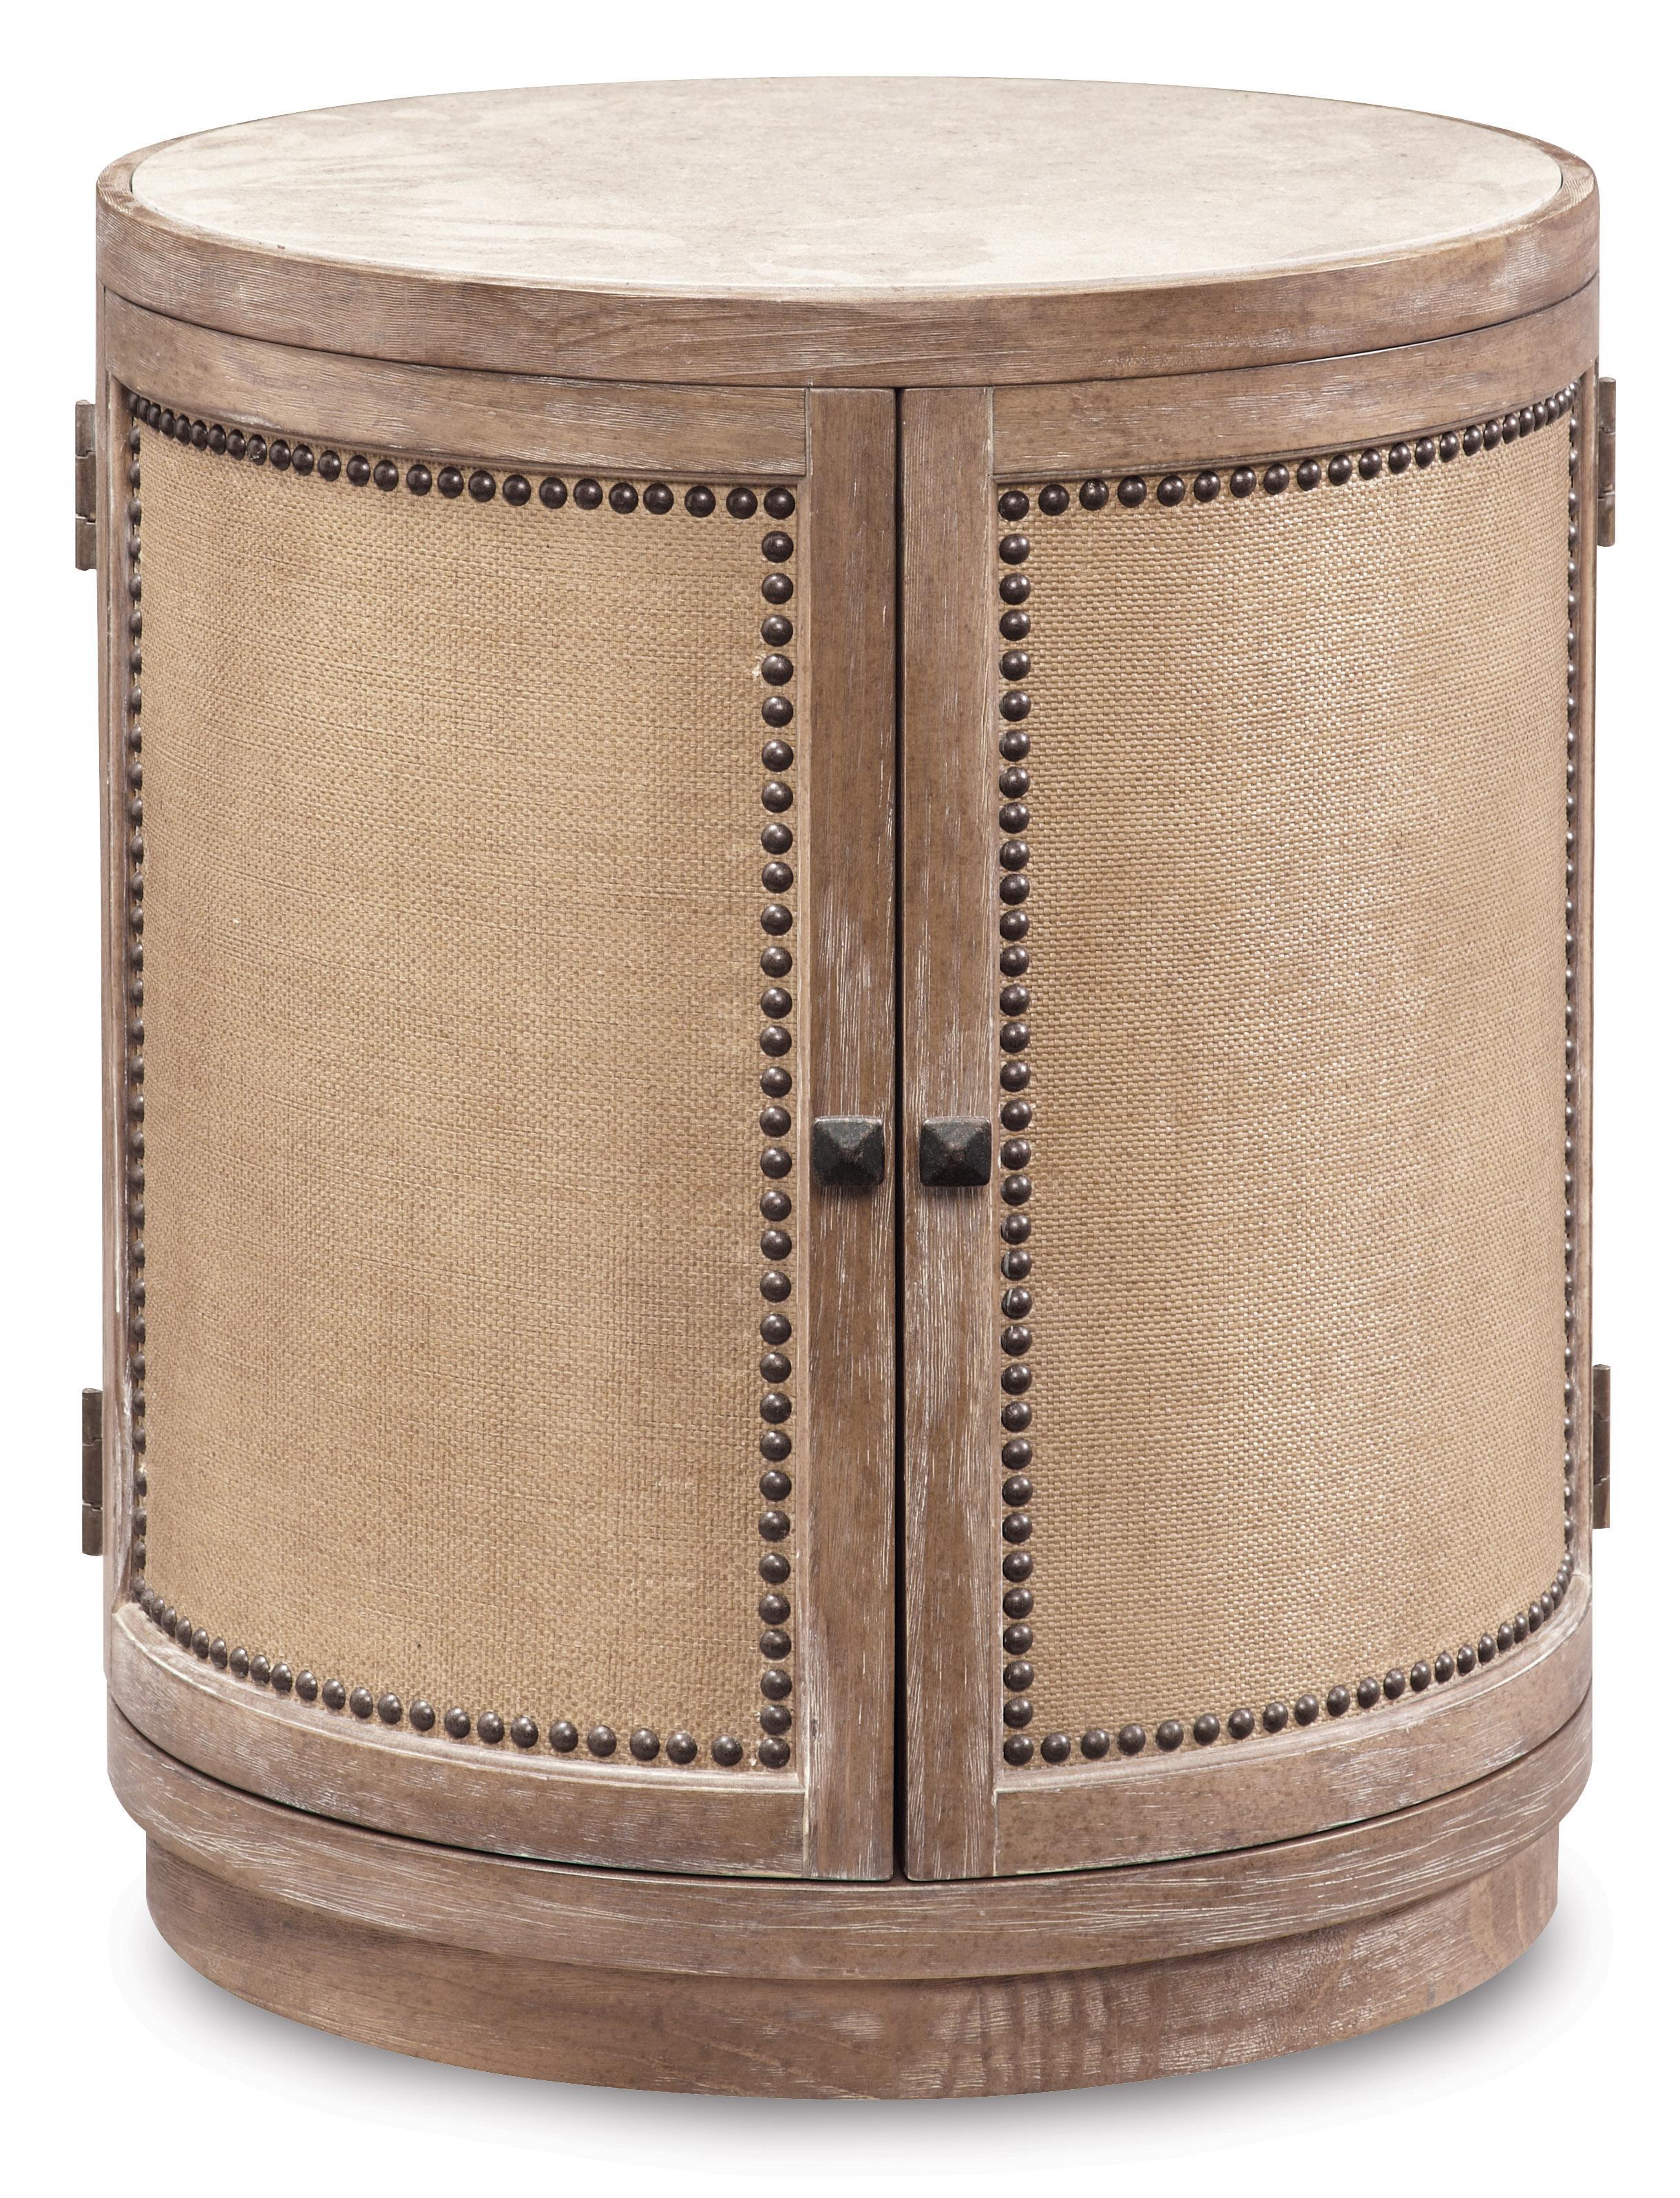 Belfort Signature Madera Round Lamp Table - Item Number: 192303-2303